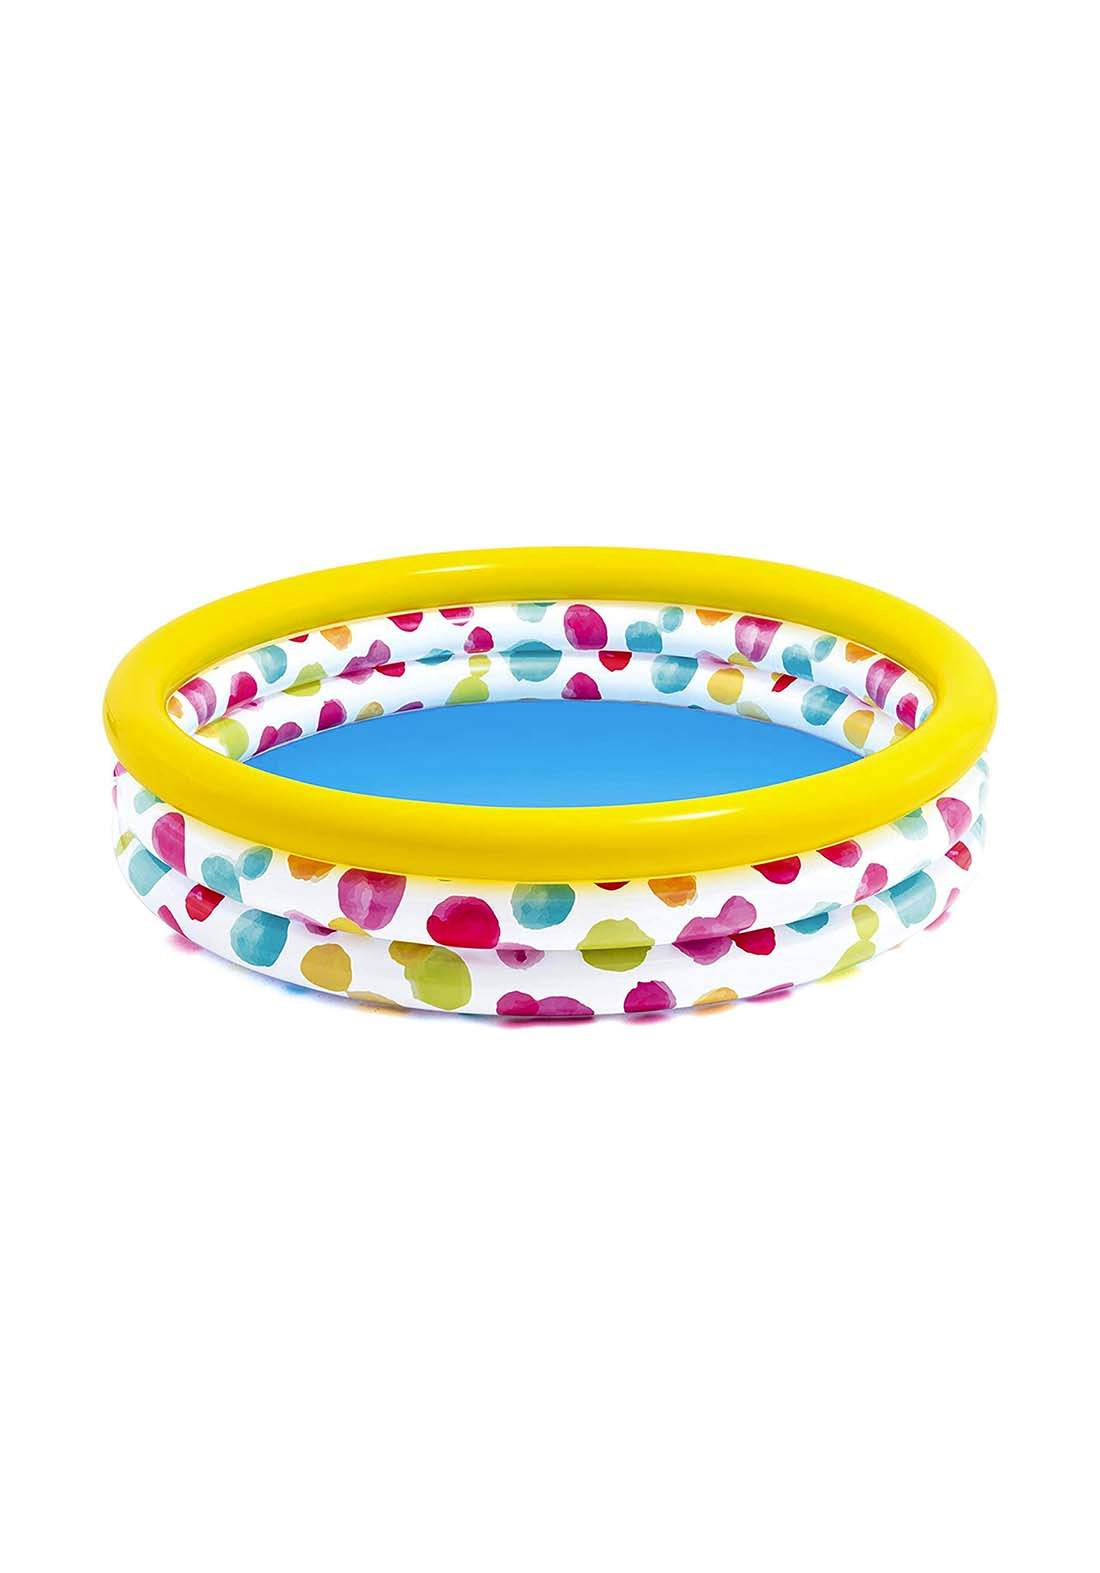 Intex 58439NP Inflatable Paddling Pool Ring مسبح